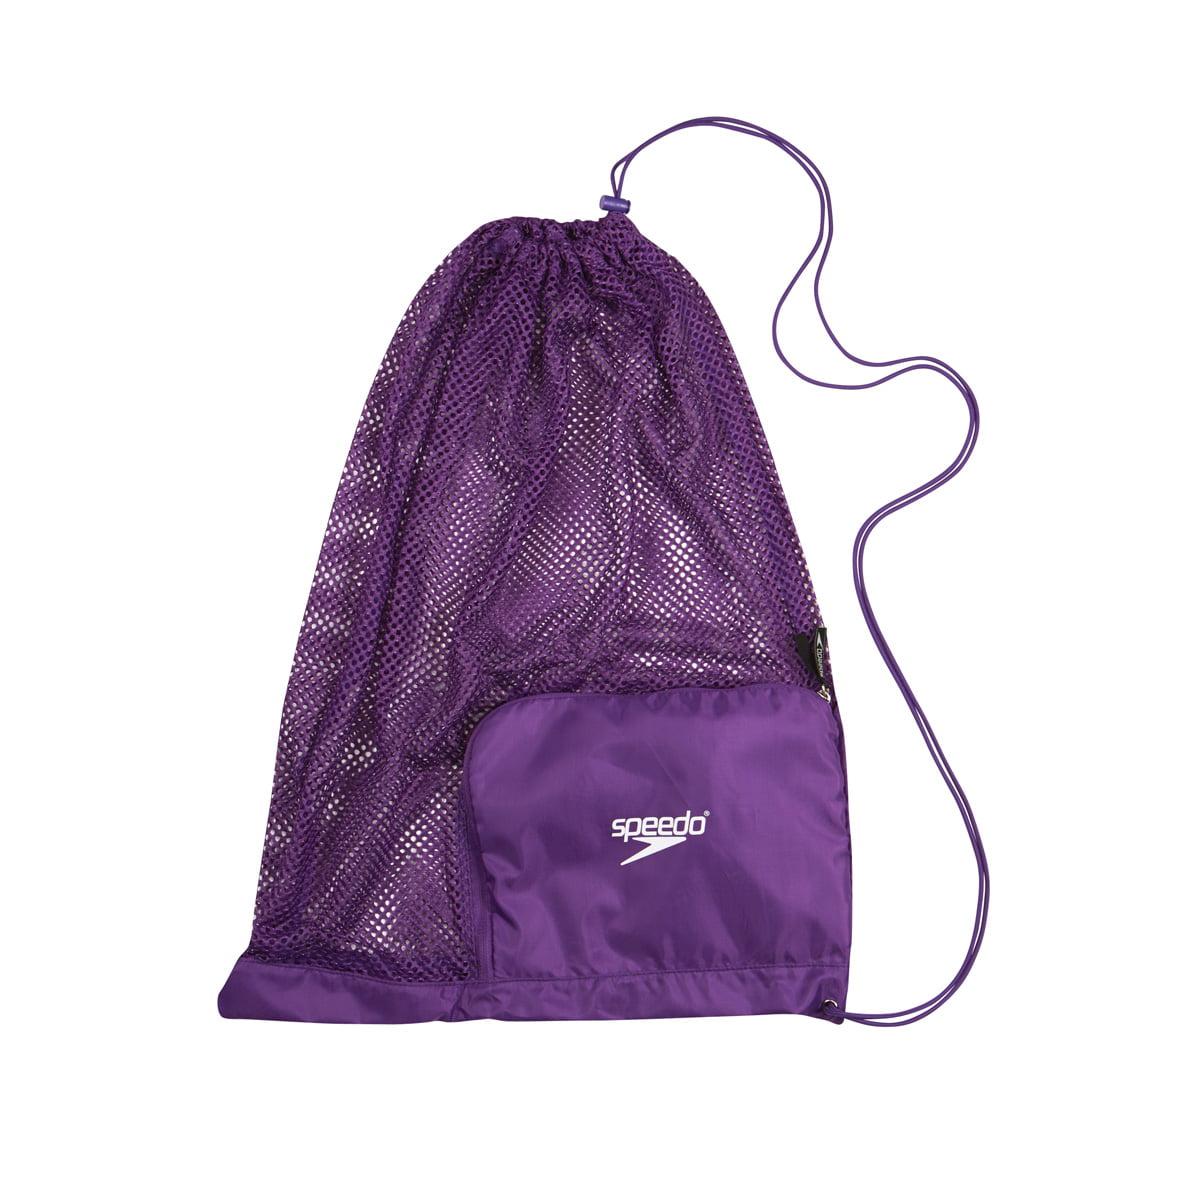 Speedo Ventilator Mesh Equipment Bag by Speedo